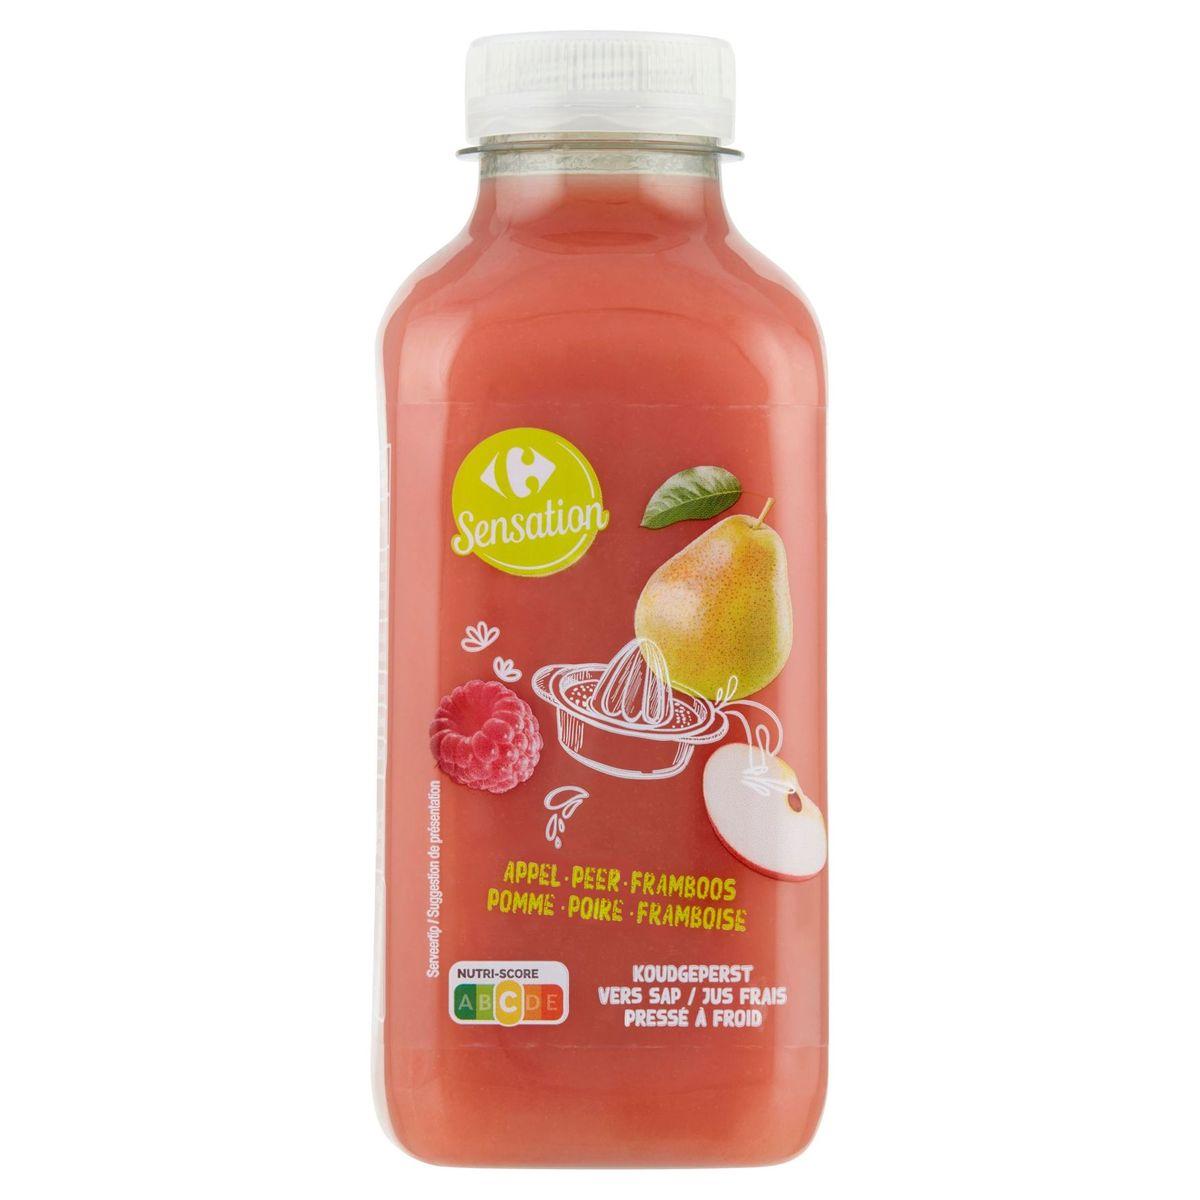 Carrefour Pomme - Poire - Framboise Jus Frais 500 ml